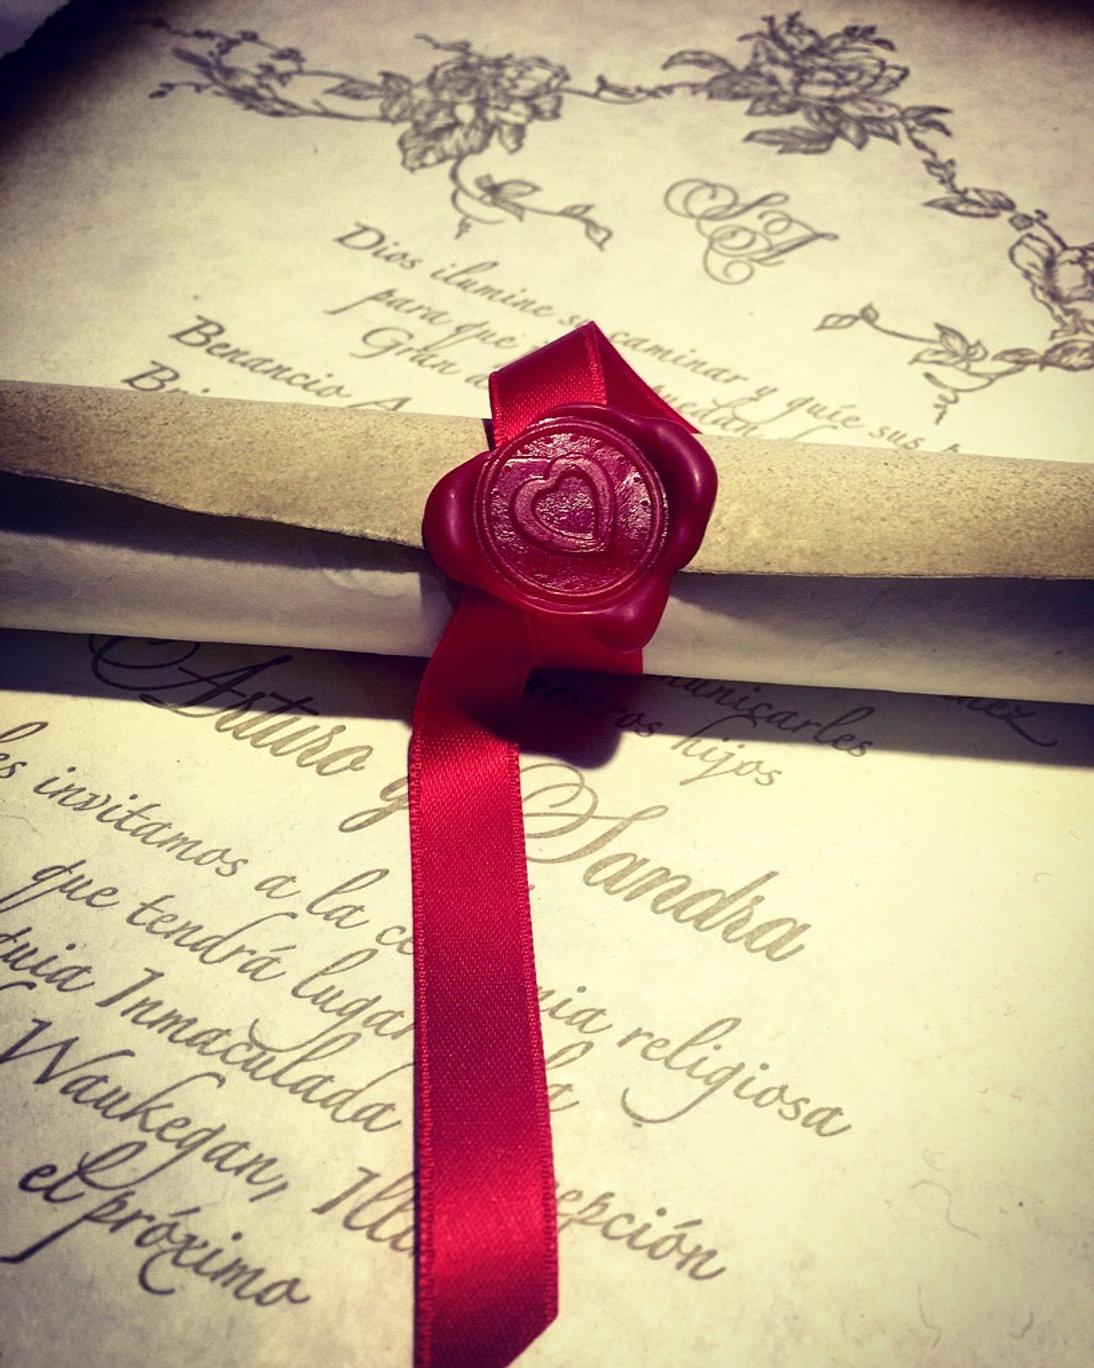 Chicago custom designed wedding invitations. Letterpress Printing.